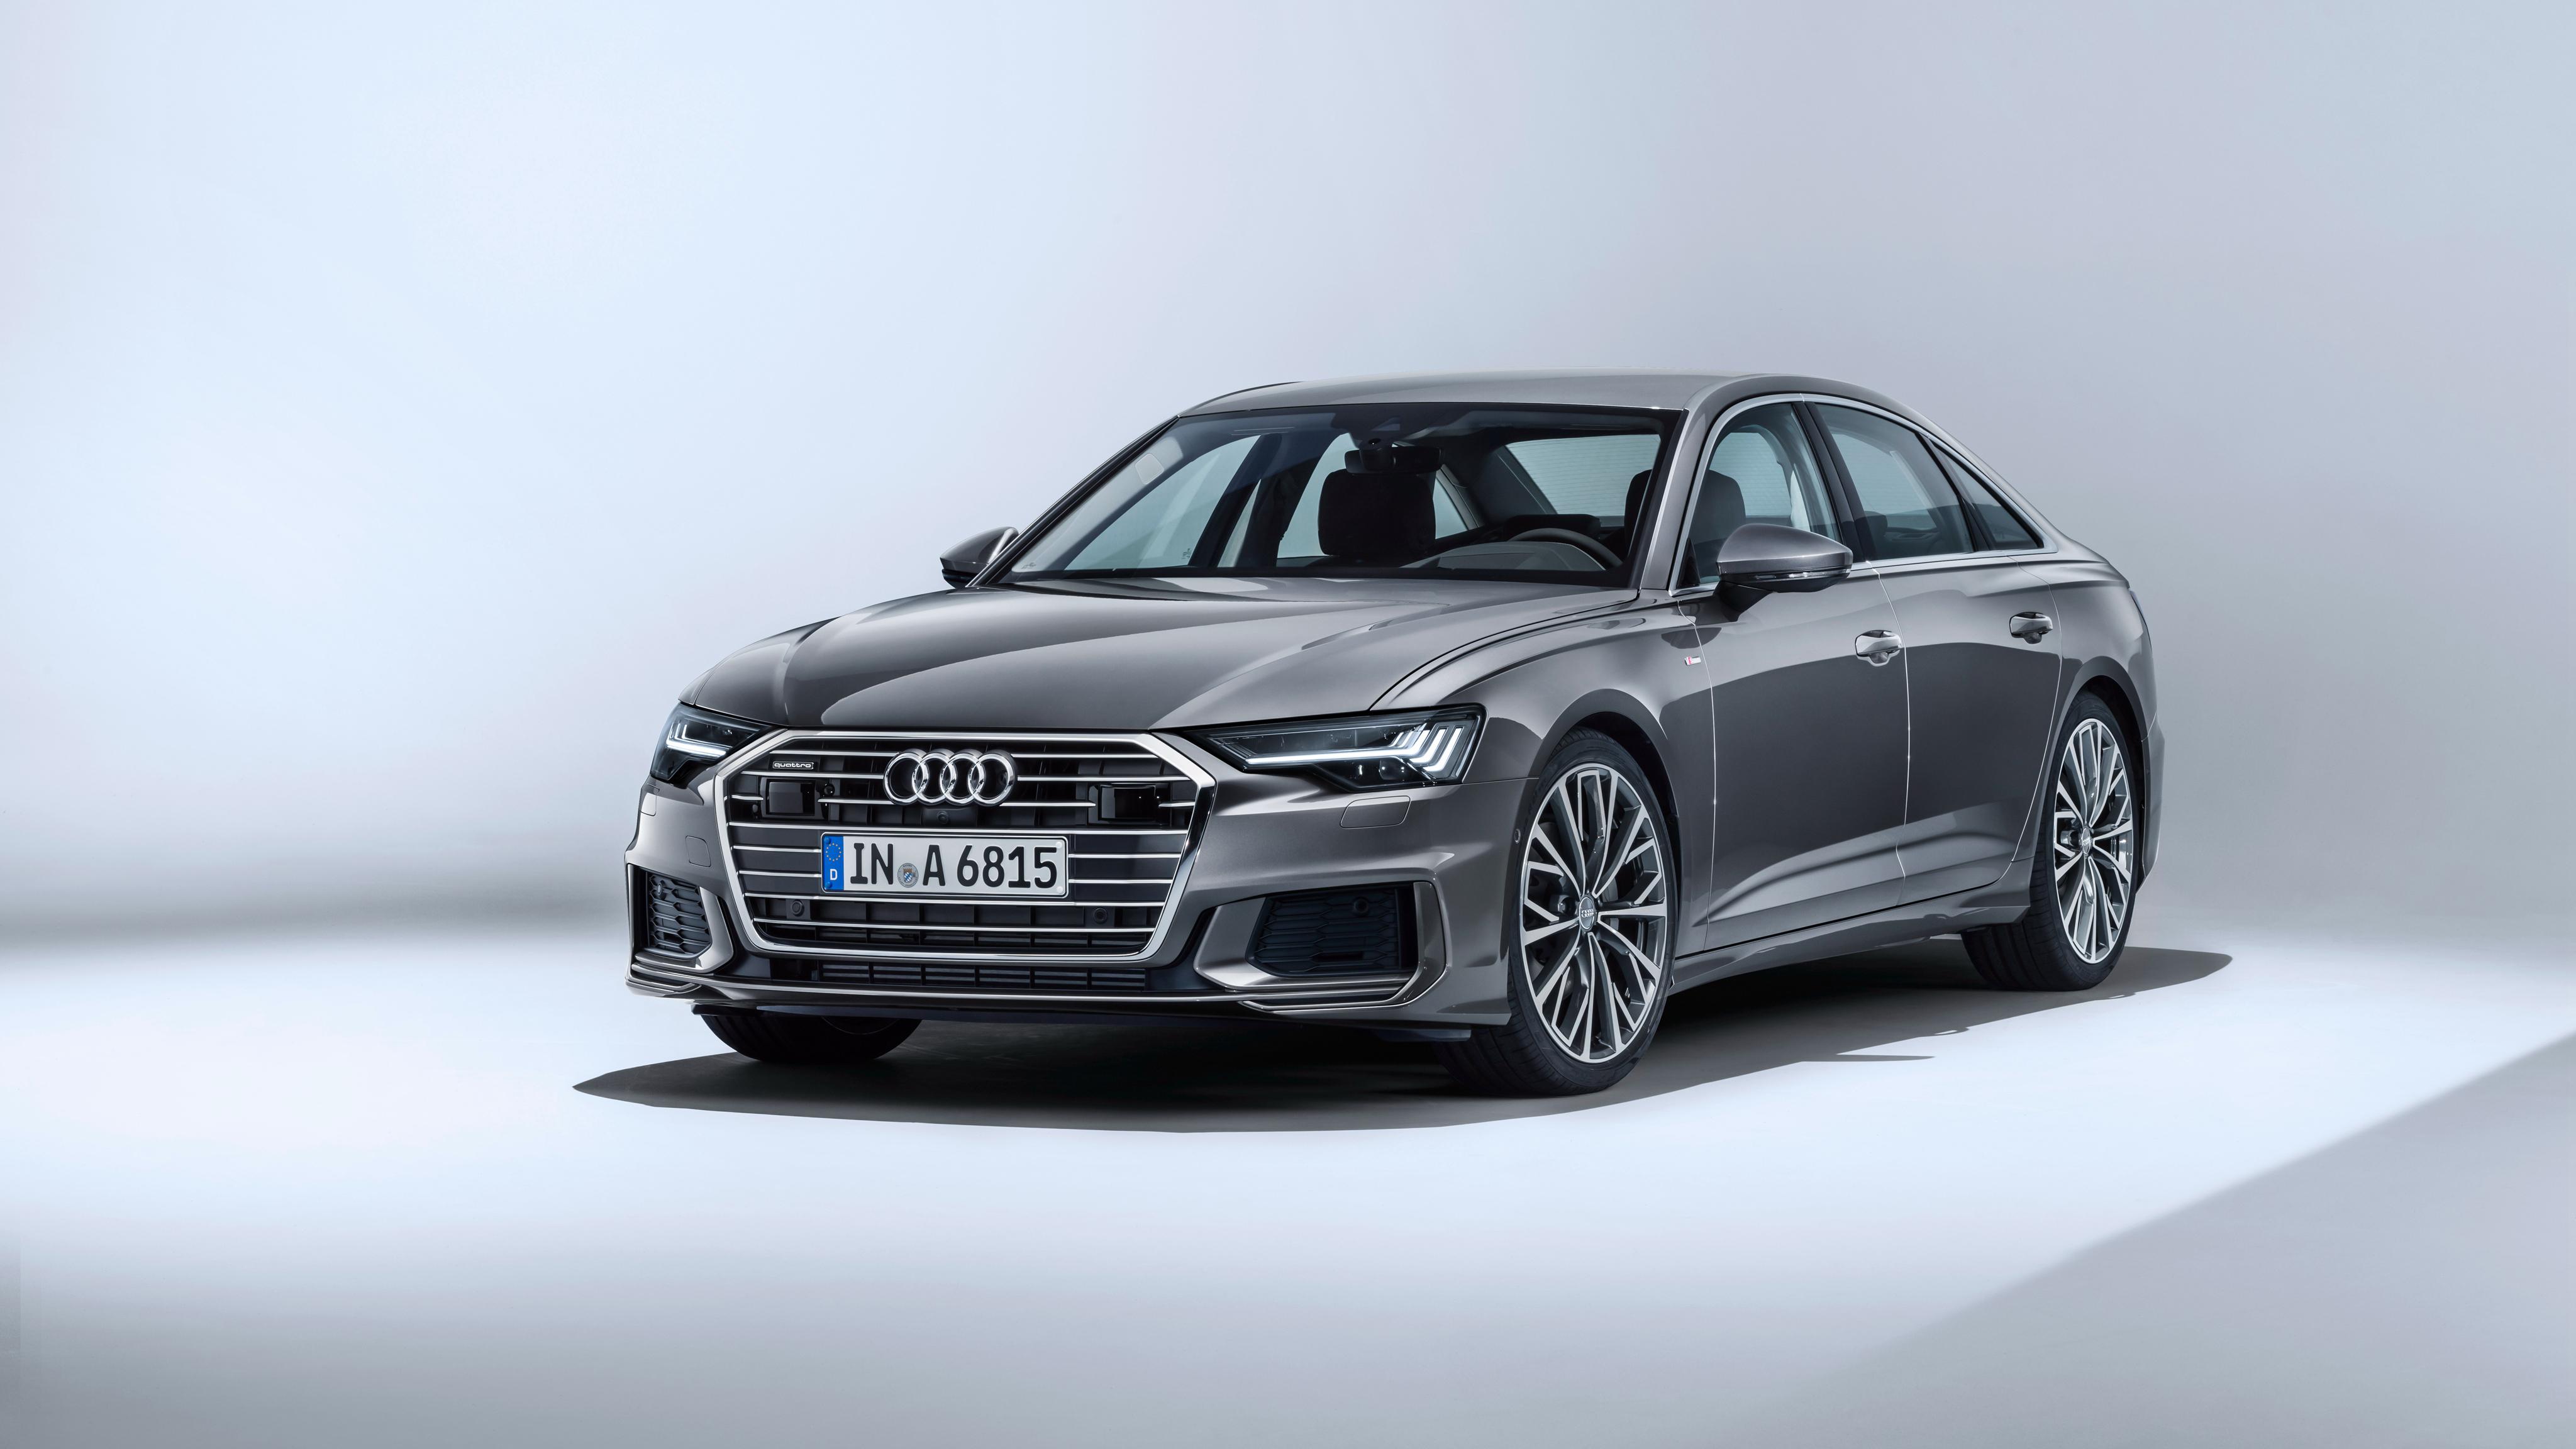 2018 Audi A6 50 Tdi Quattro S Line 4k 2 Wallpaper Hd Car